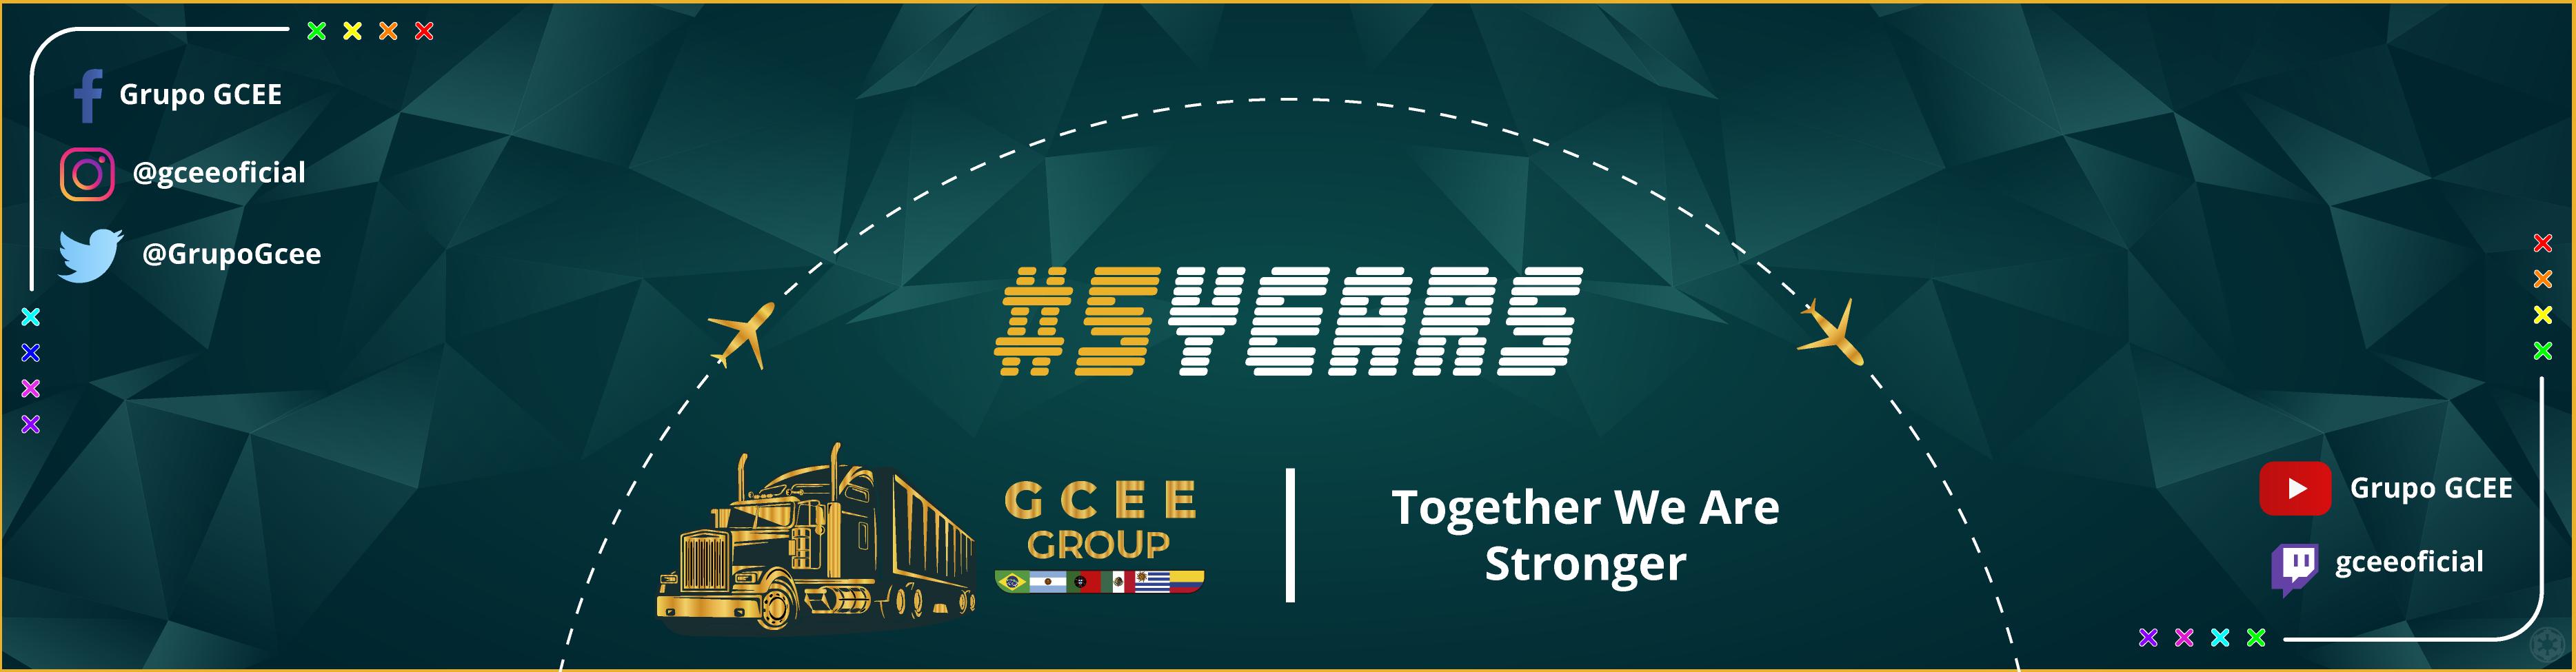 GCEE Latin-America | Avant VTC 2th Anniversary